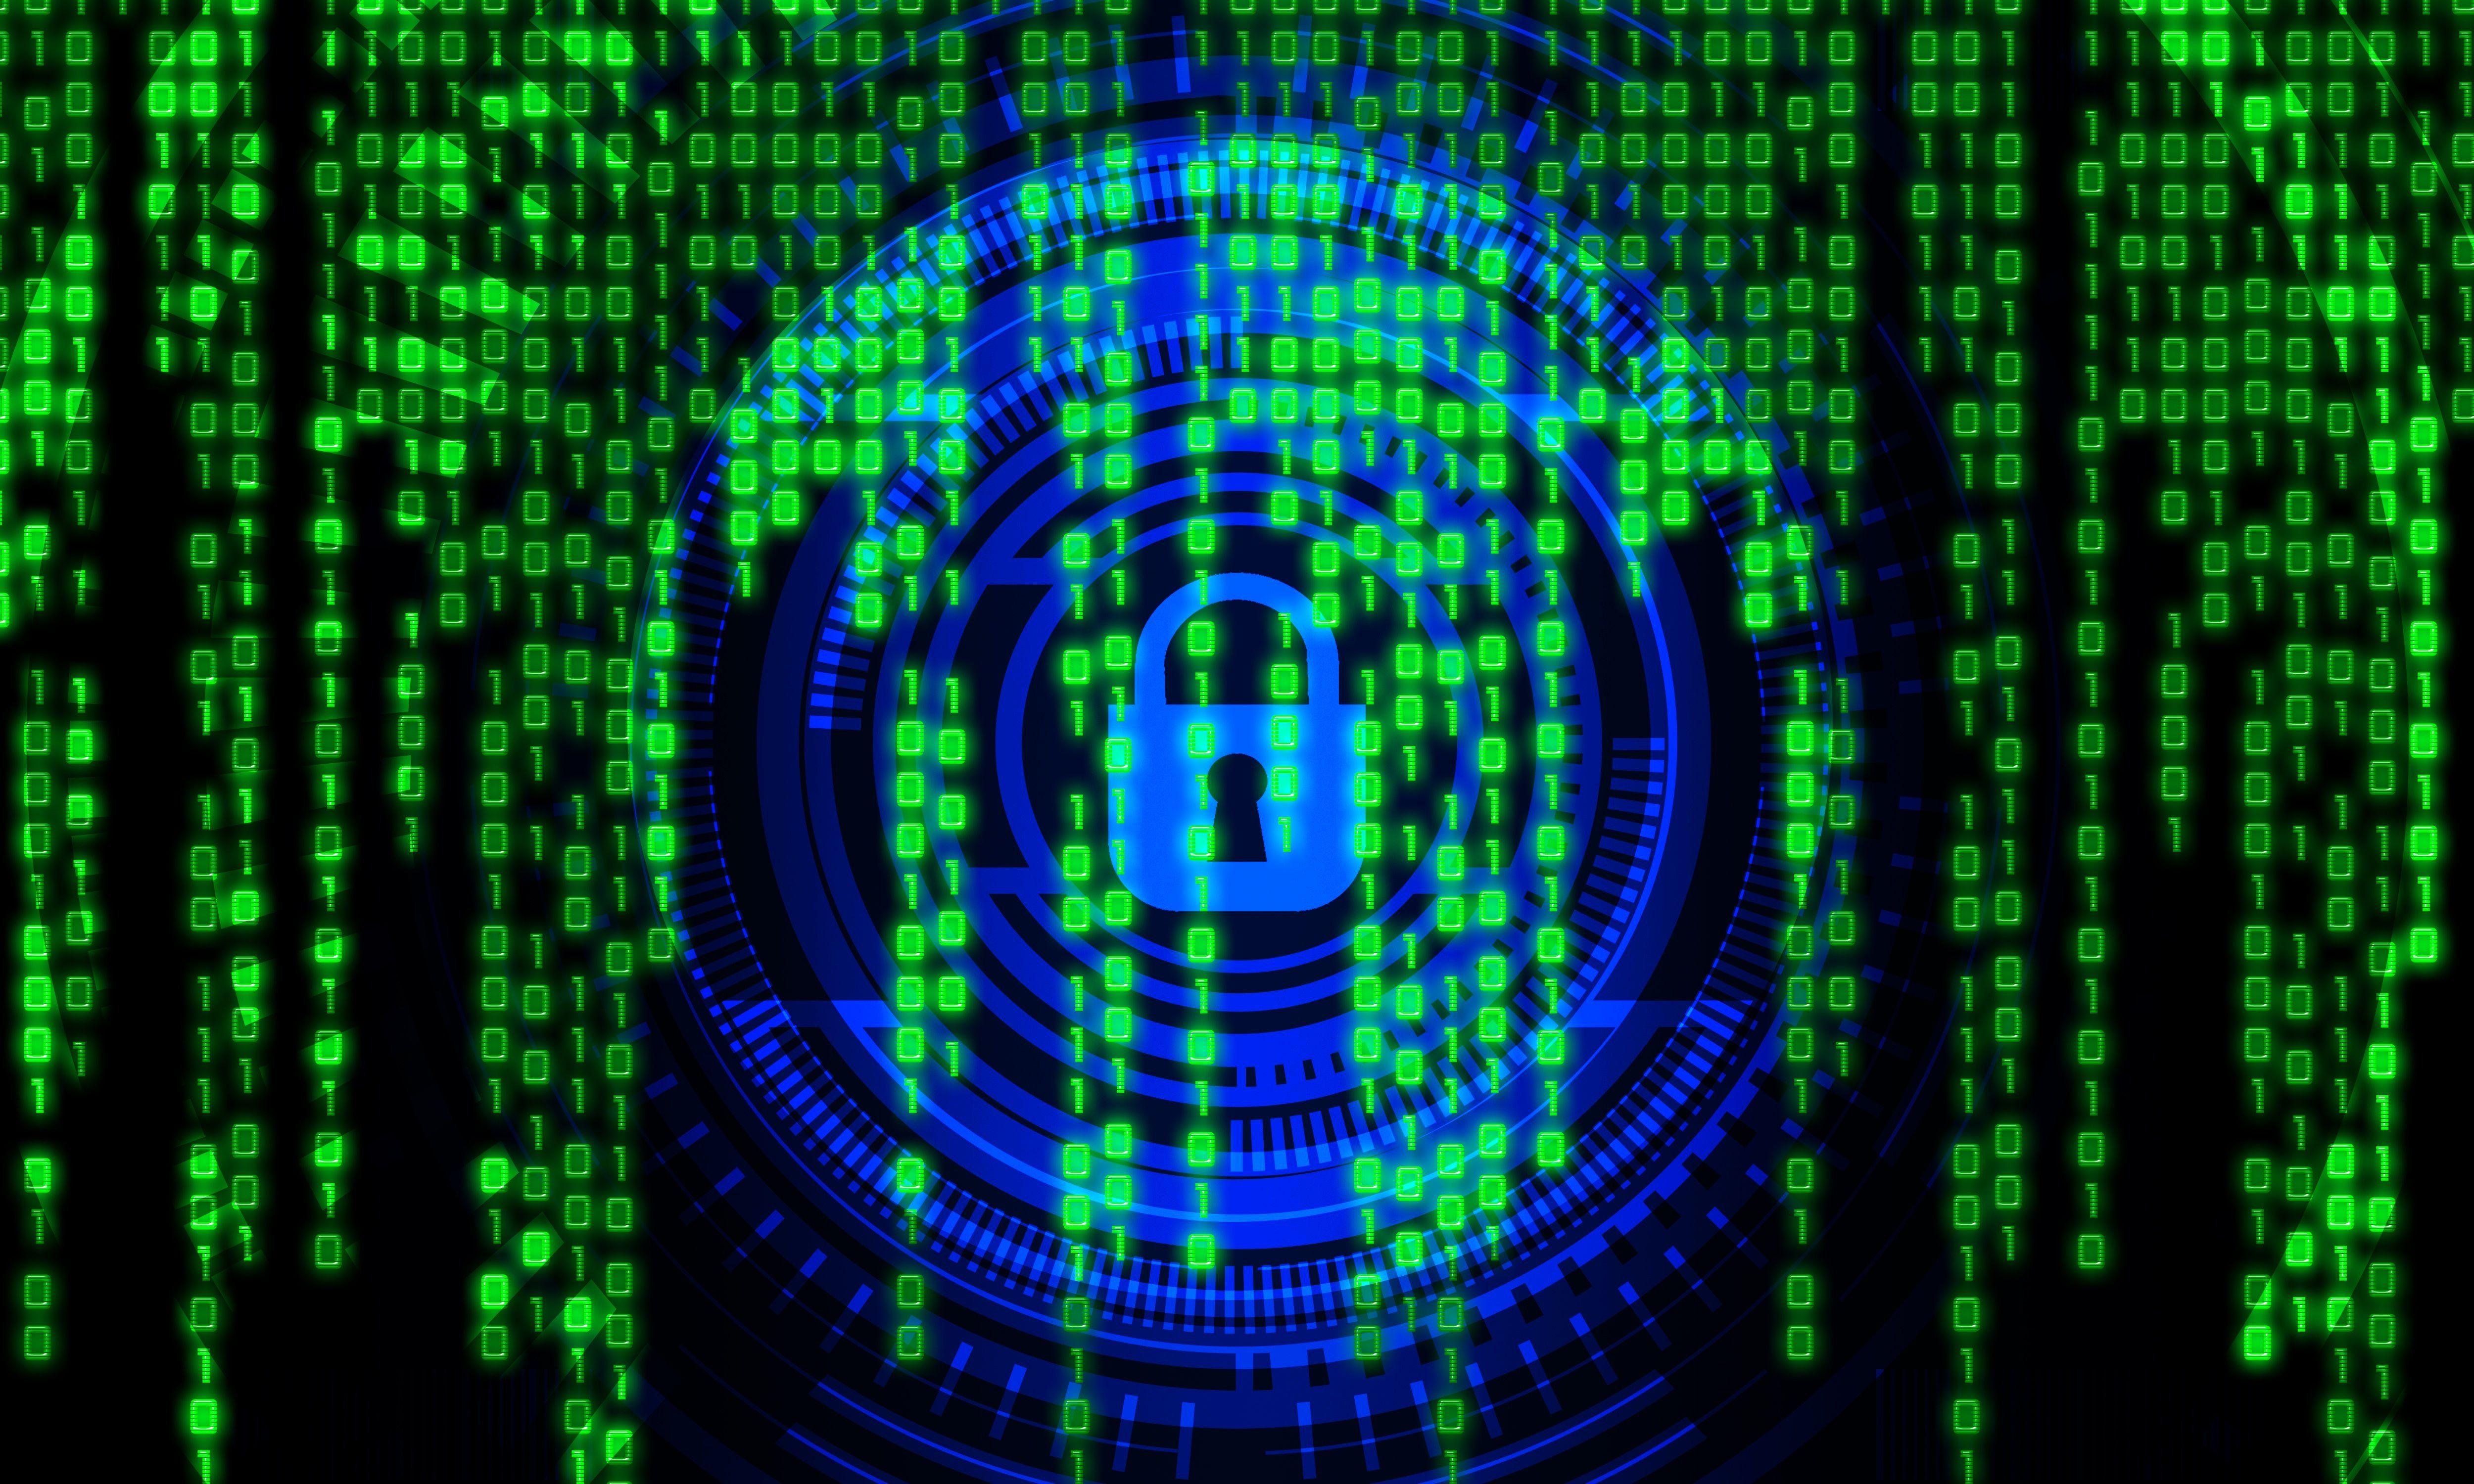 cyber-security-3400555.jpg